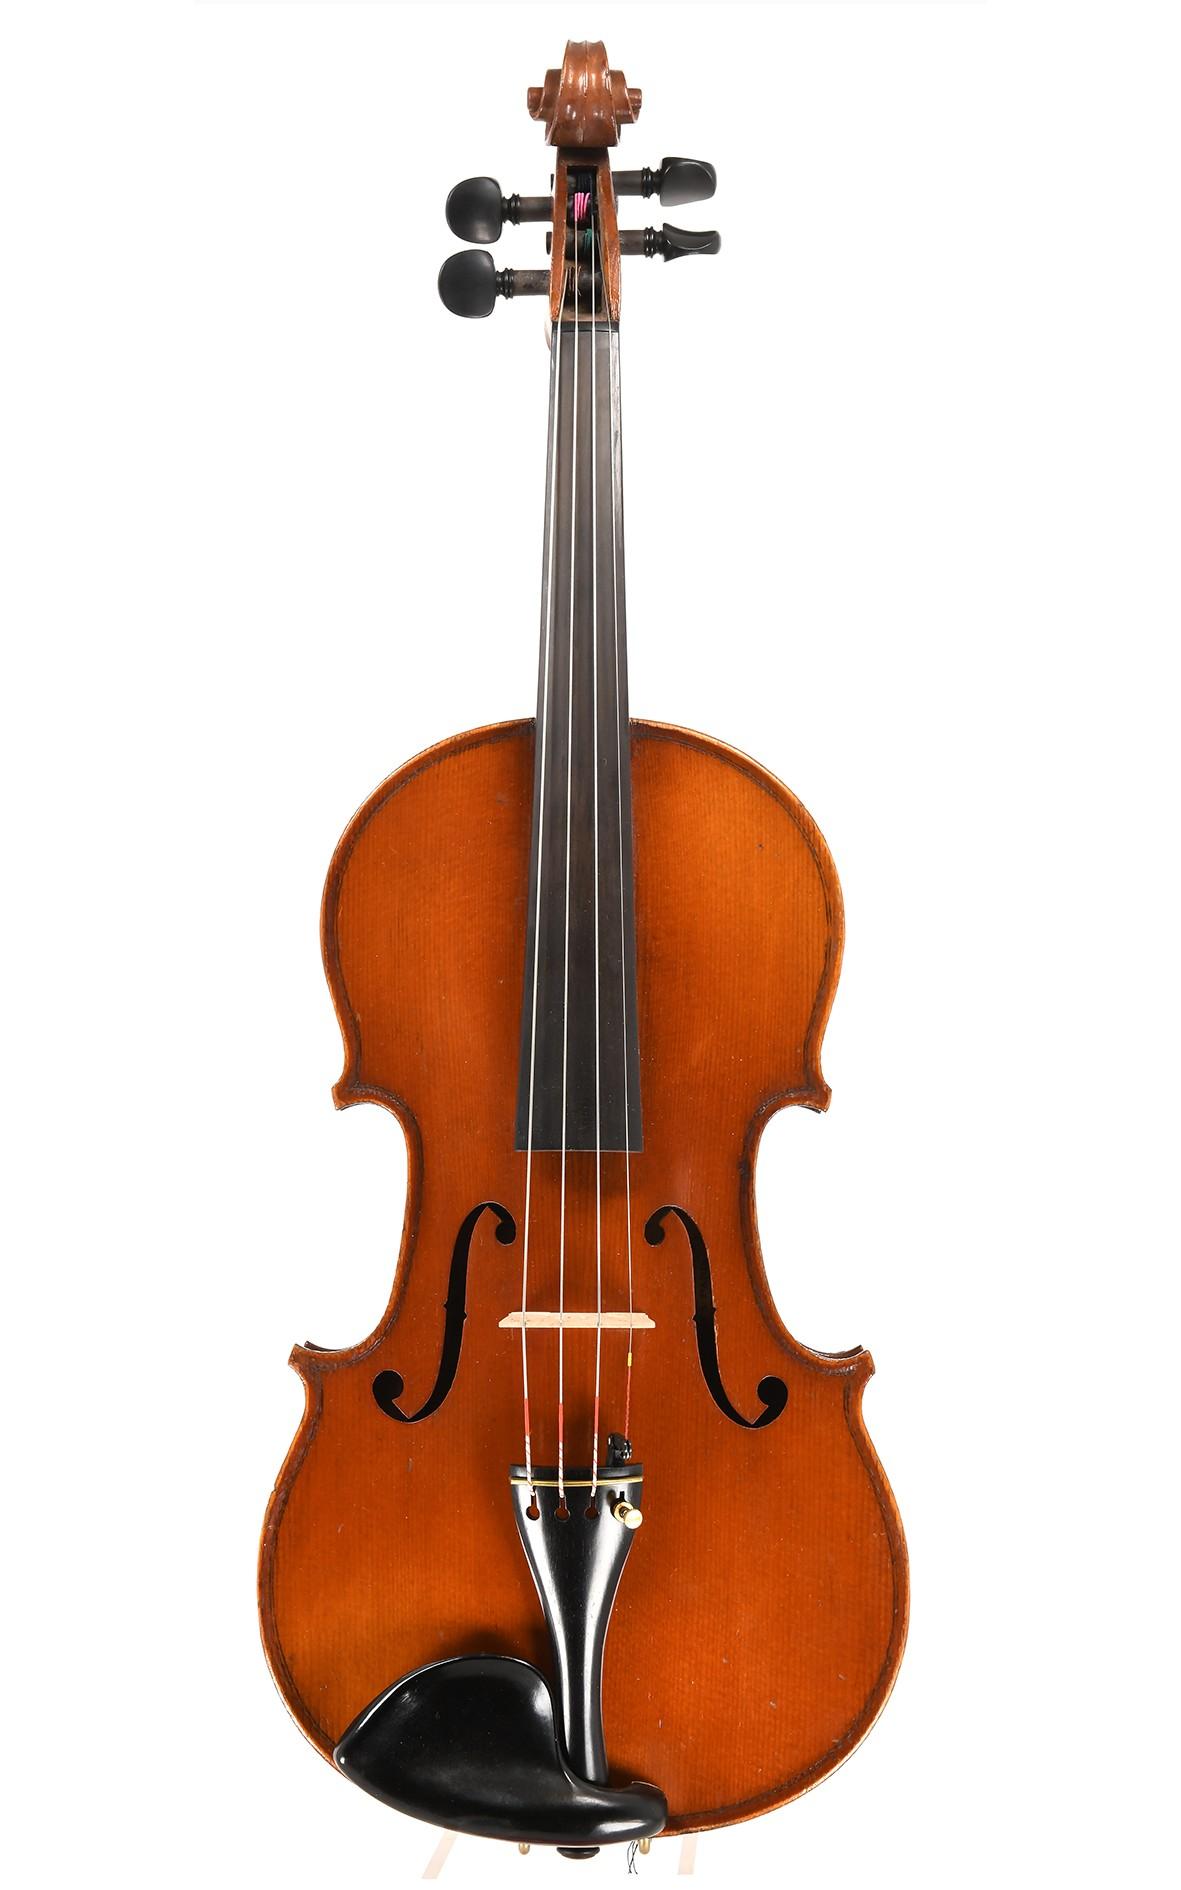 Antique violin for sale by J.T.L.